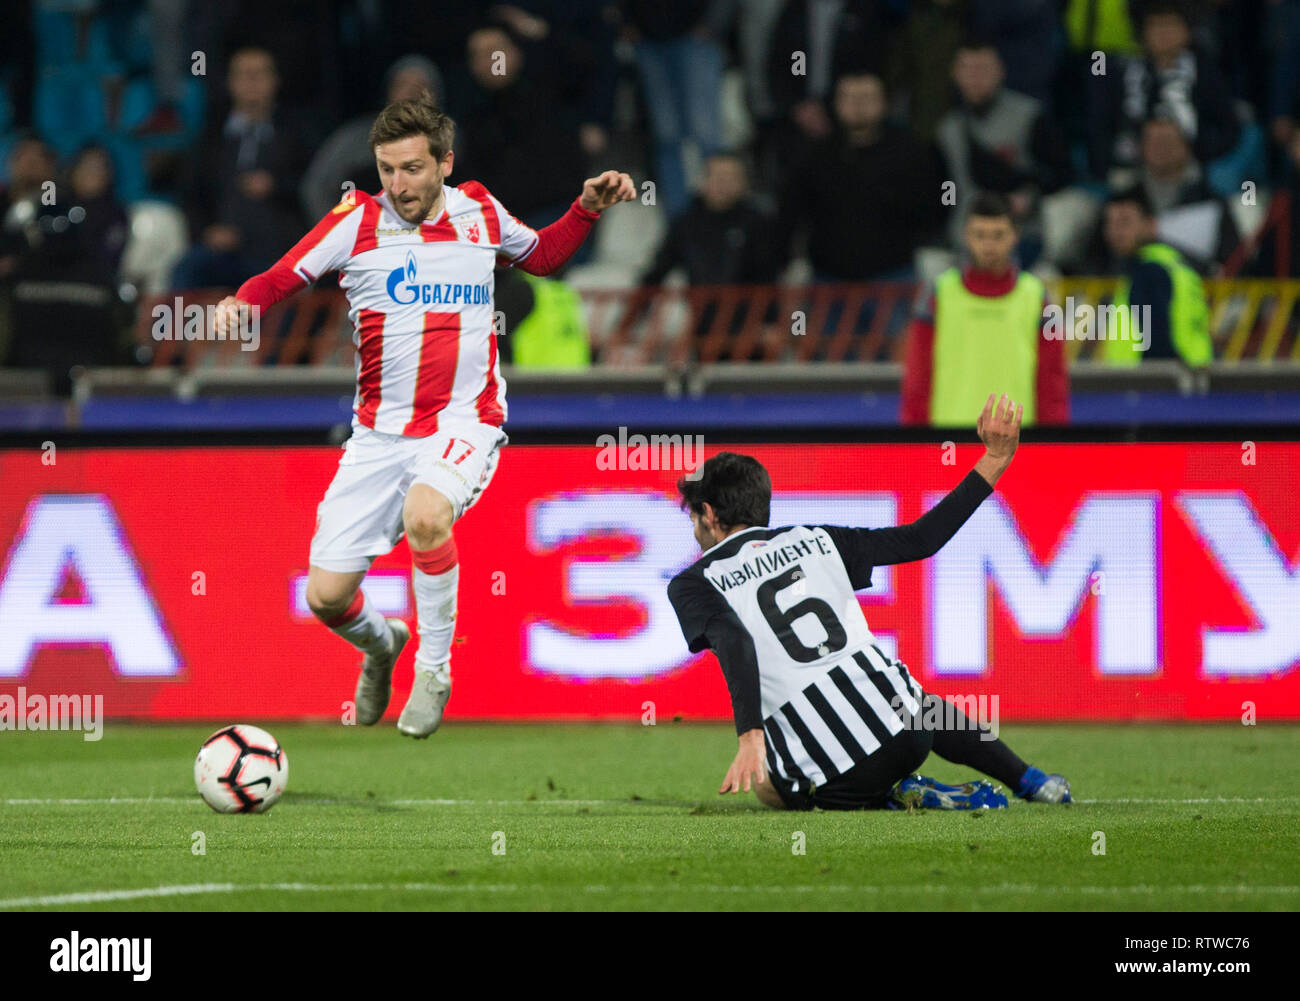 Rajko Mitic Stadion Belgrad Serbien 2 Mar 2019